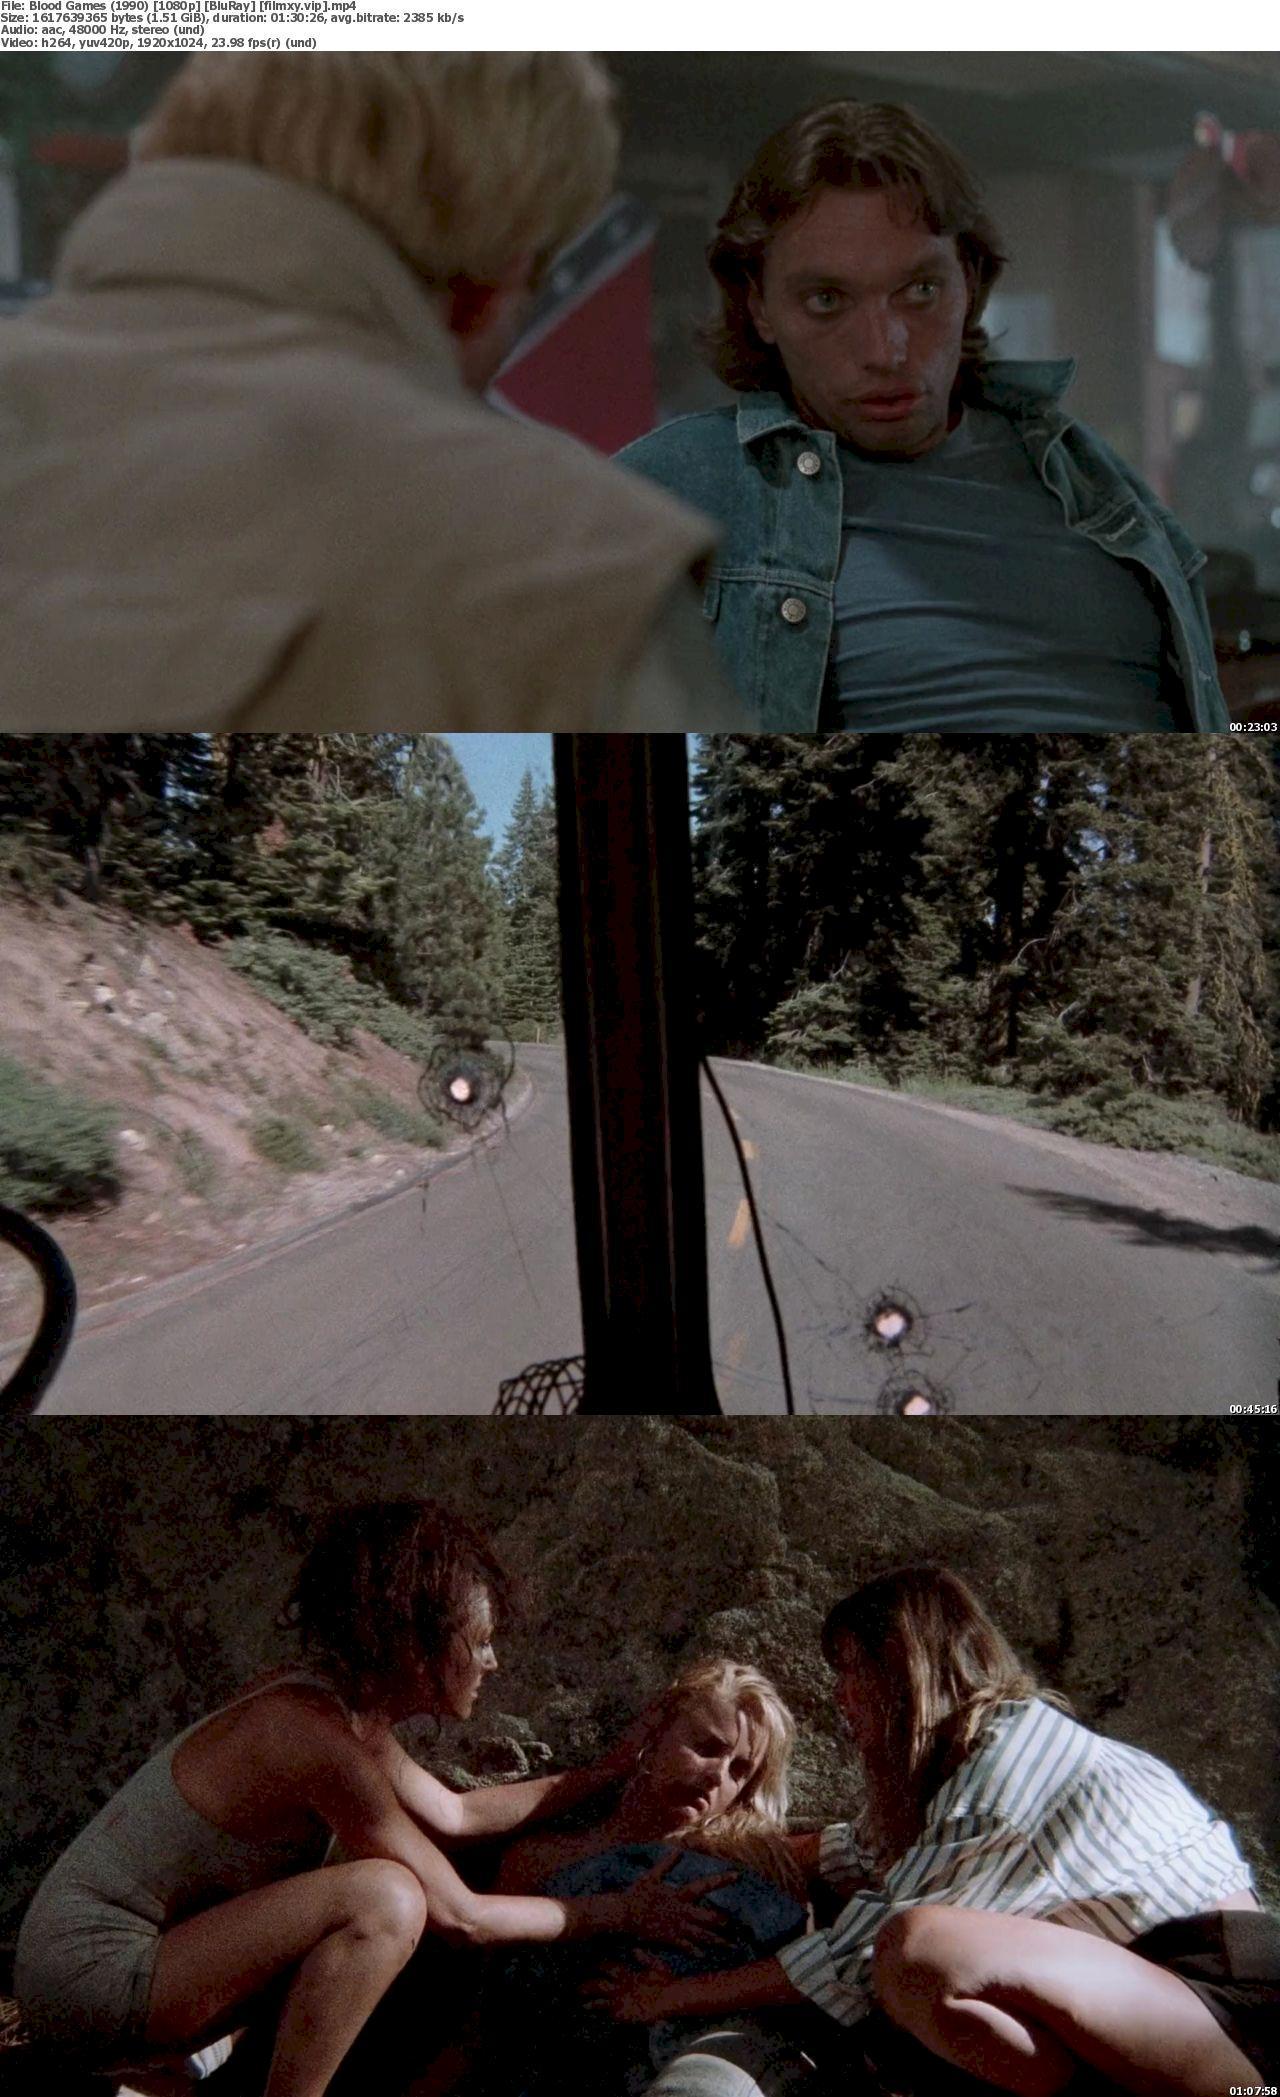 Watch Blood Games (1990) Full Movie on Filmxy